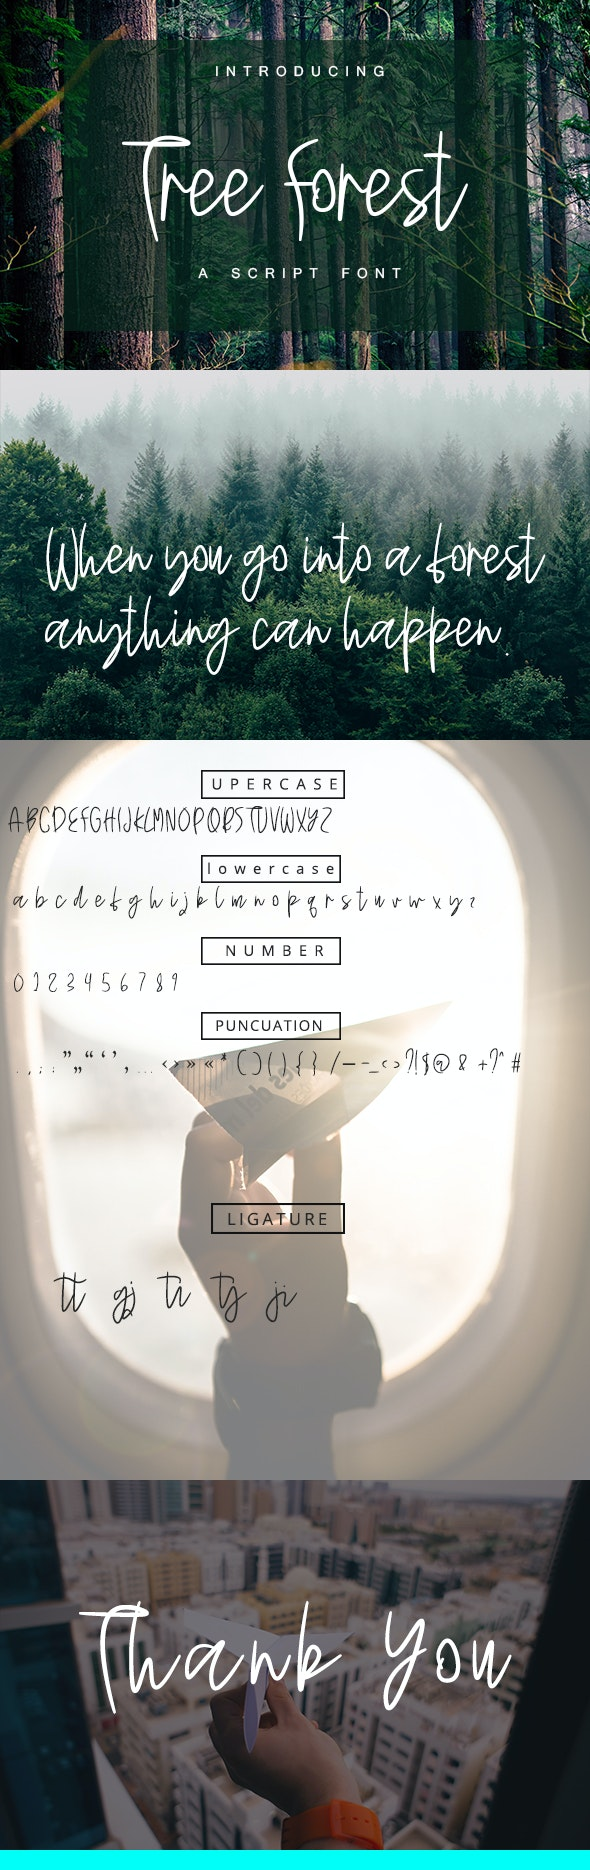 Tree Forest - Script Font - Hand-writing Script